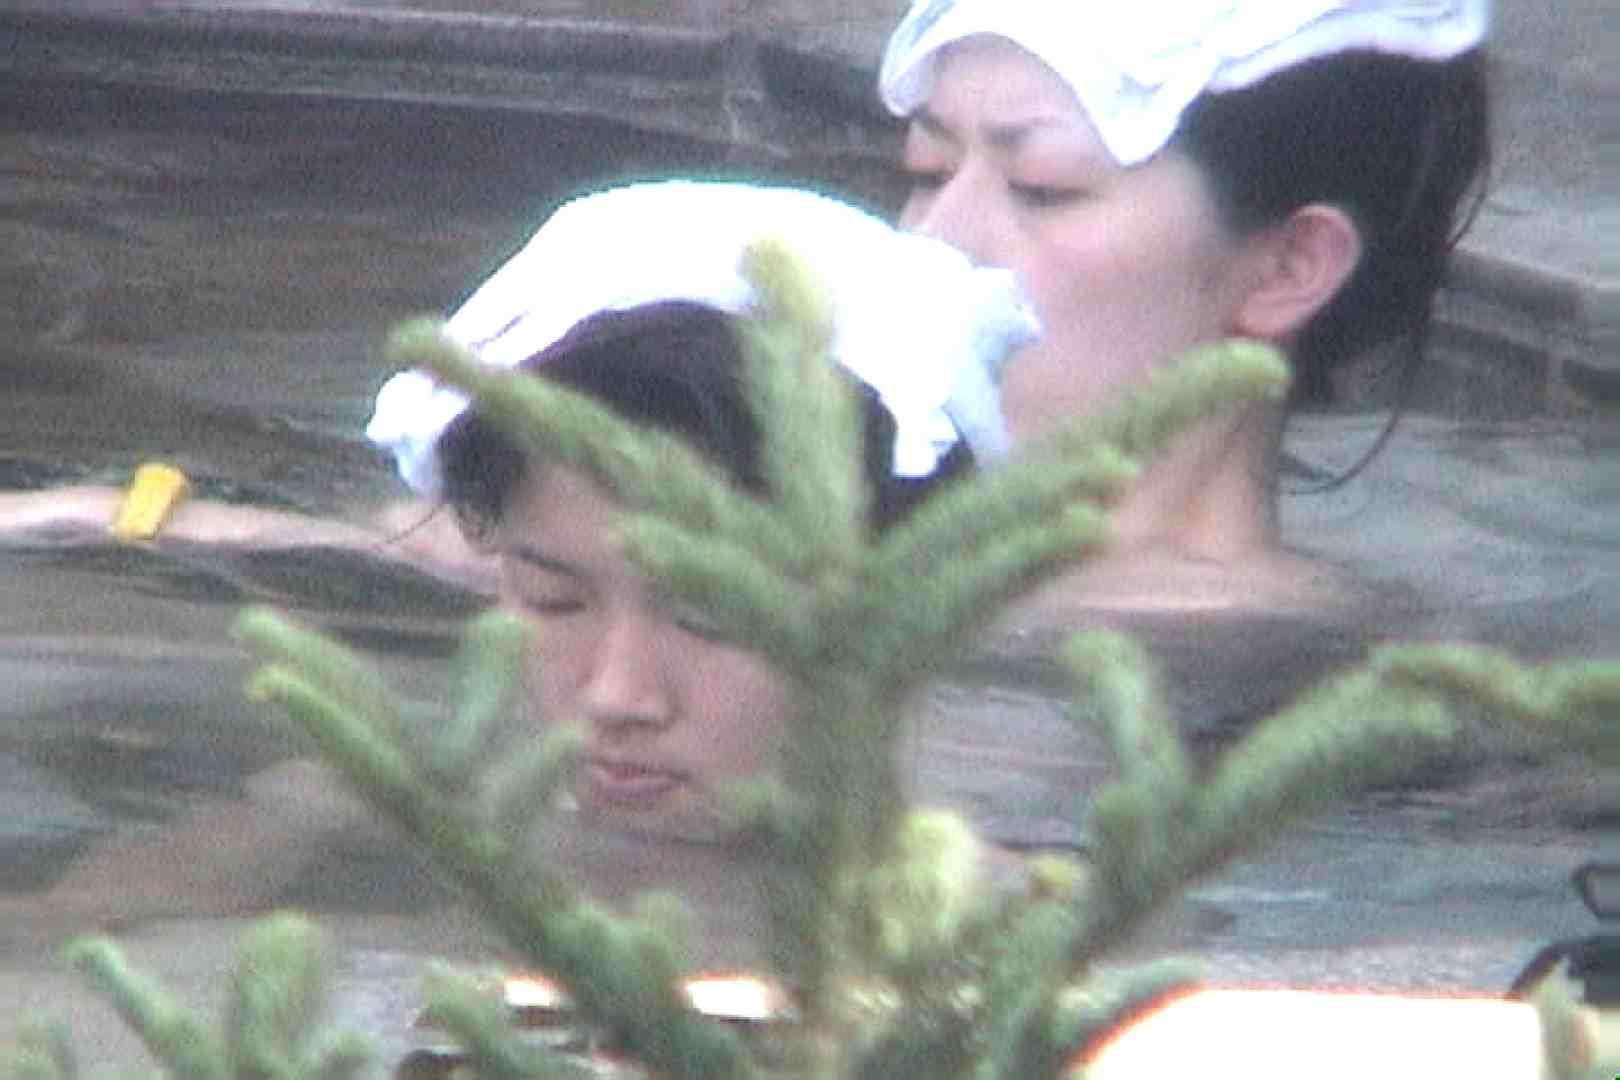 Aquaな露天風呂Vol.80【VIP限定】 露天風呂編  76PIX 30